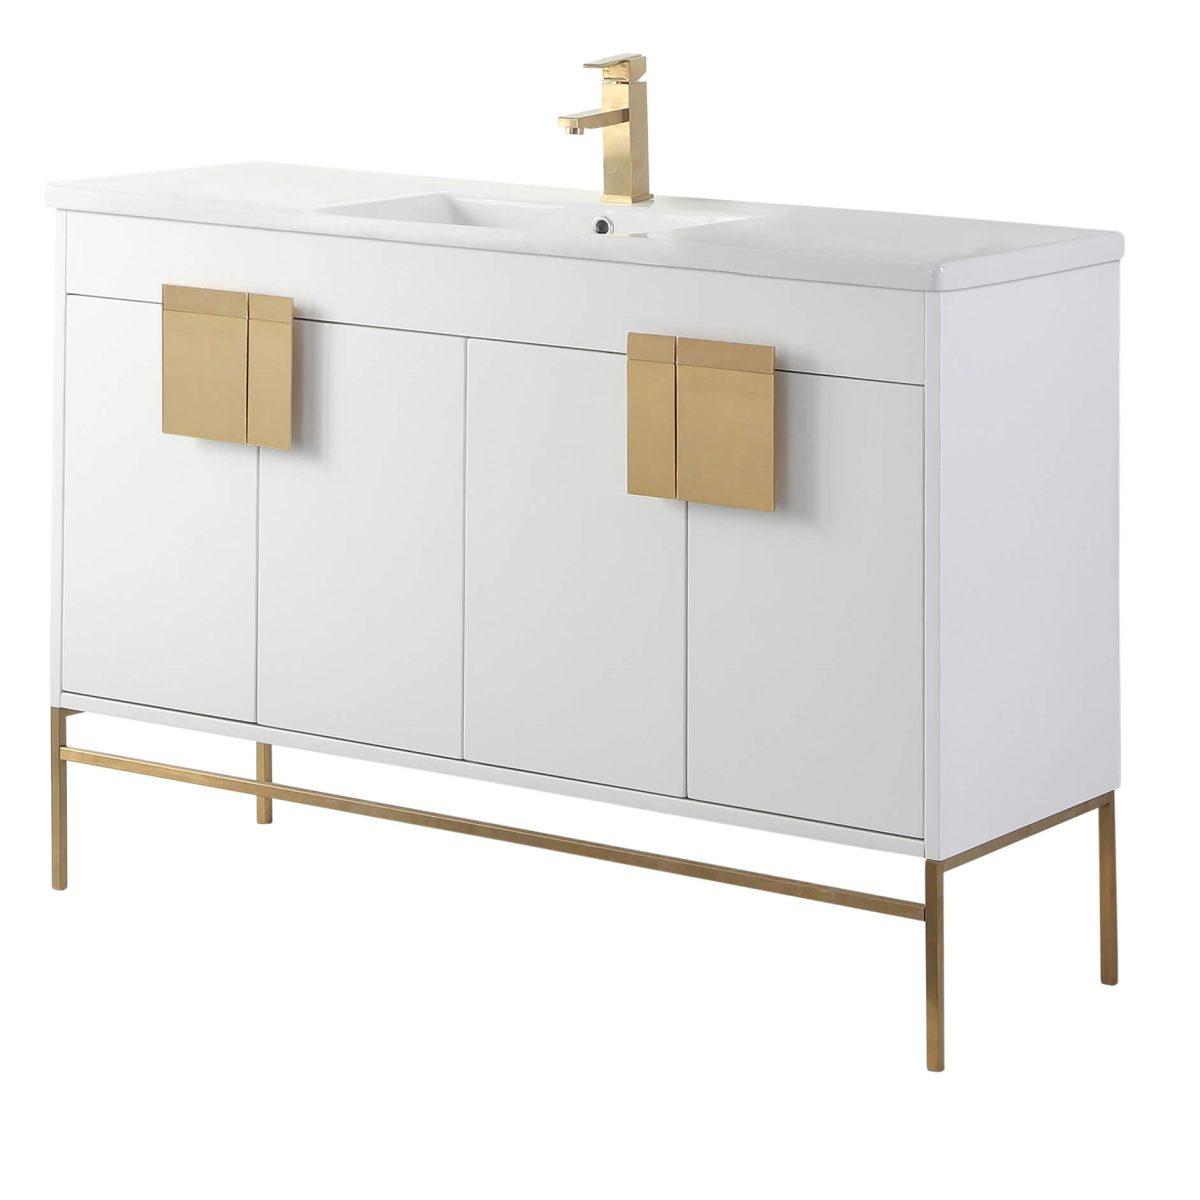 "Shawbridge 48"" Modern Single Bathroom Vanity  White with Satin Brass Hardware"